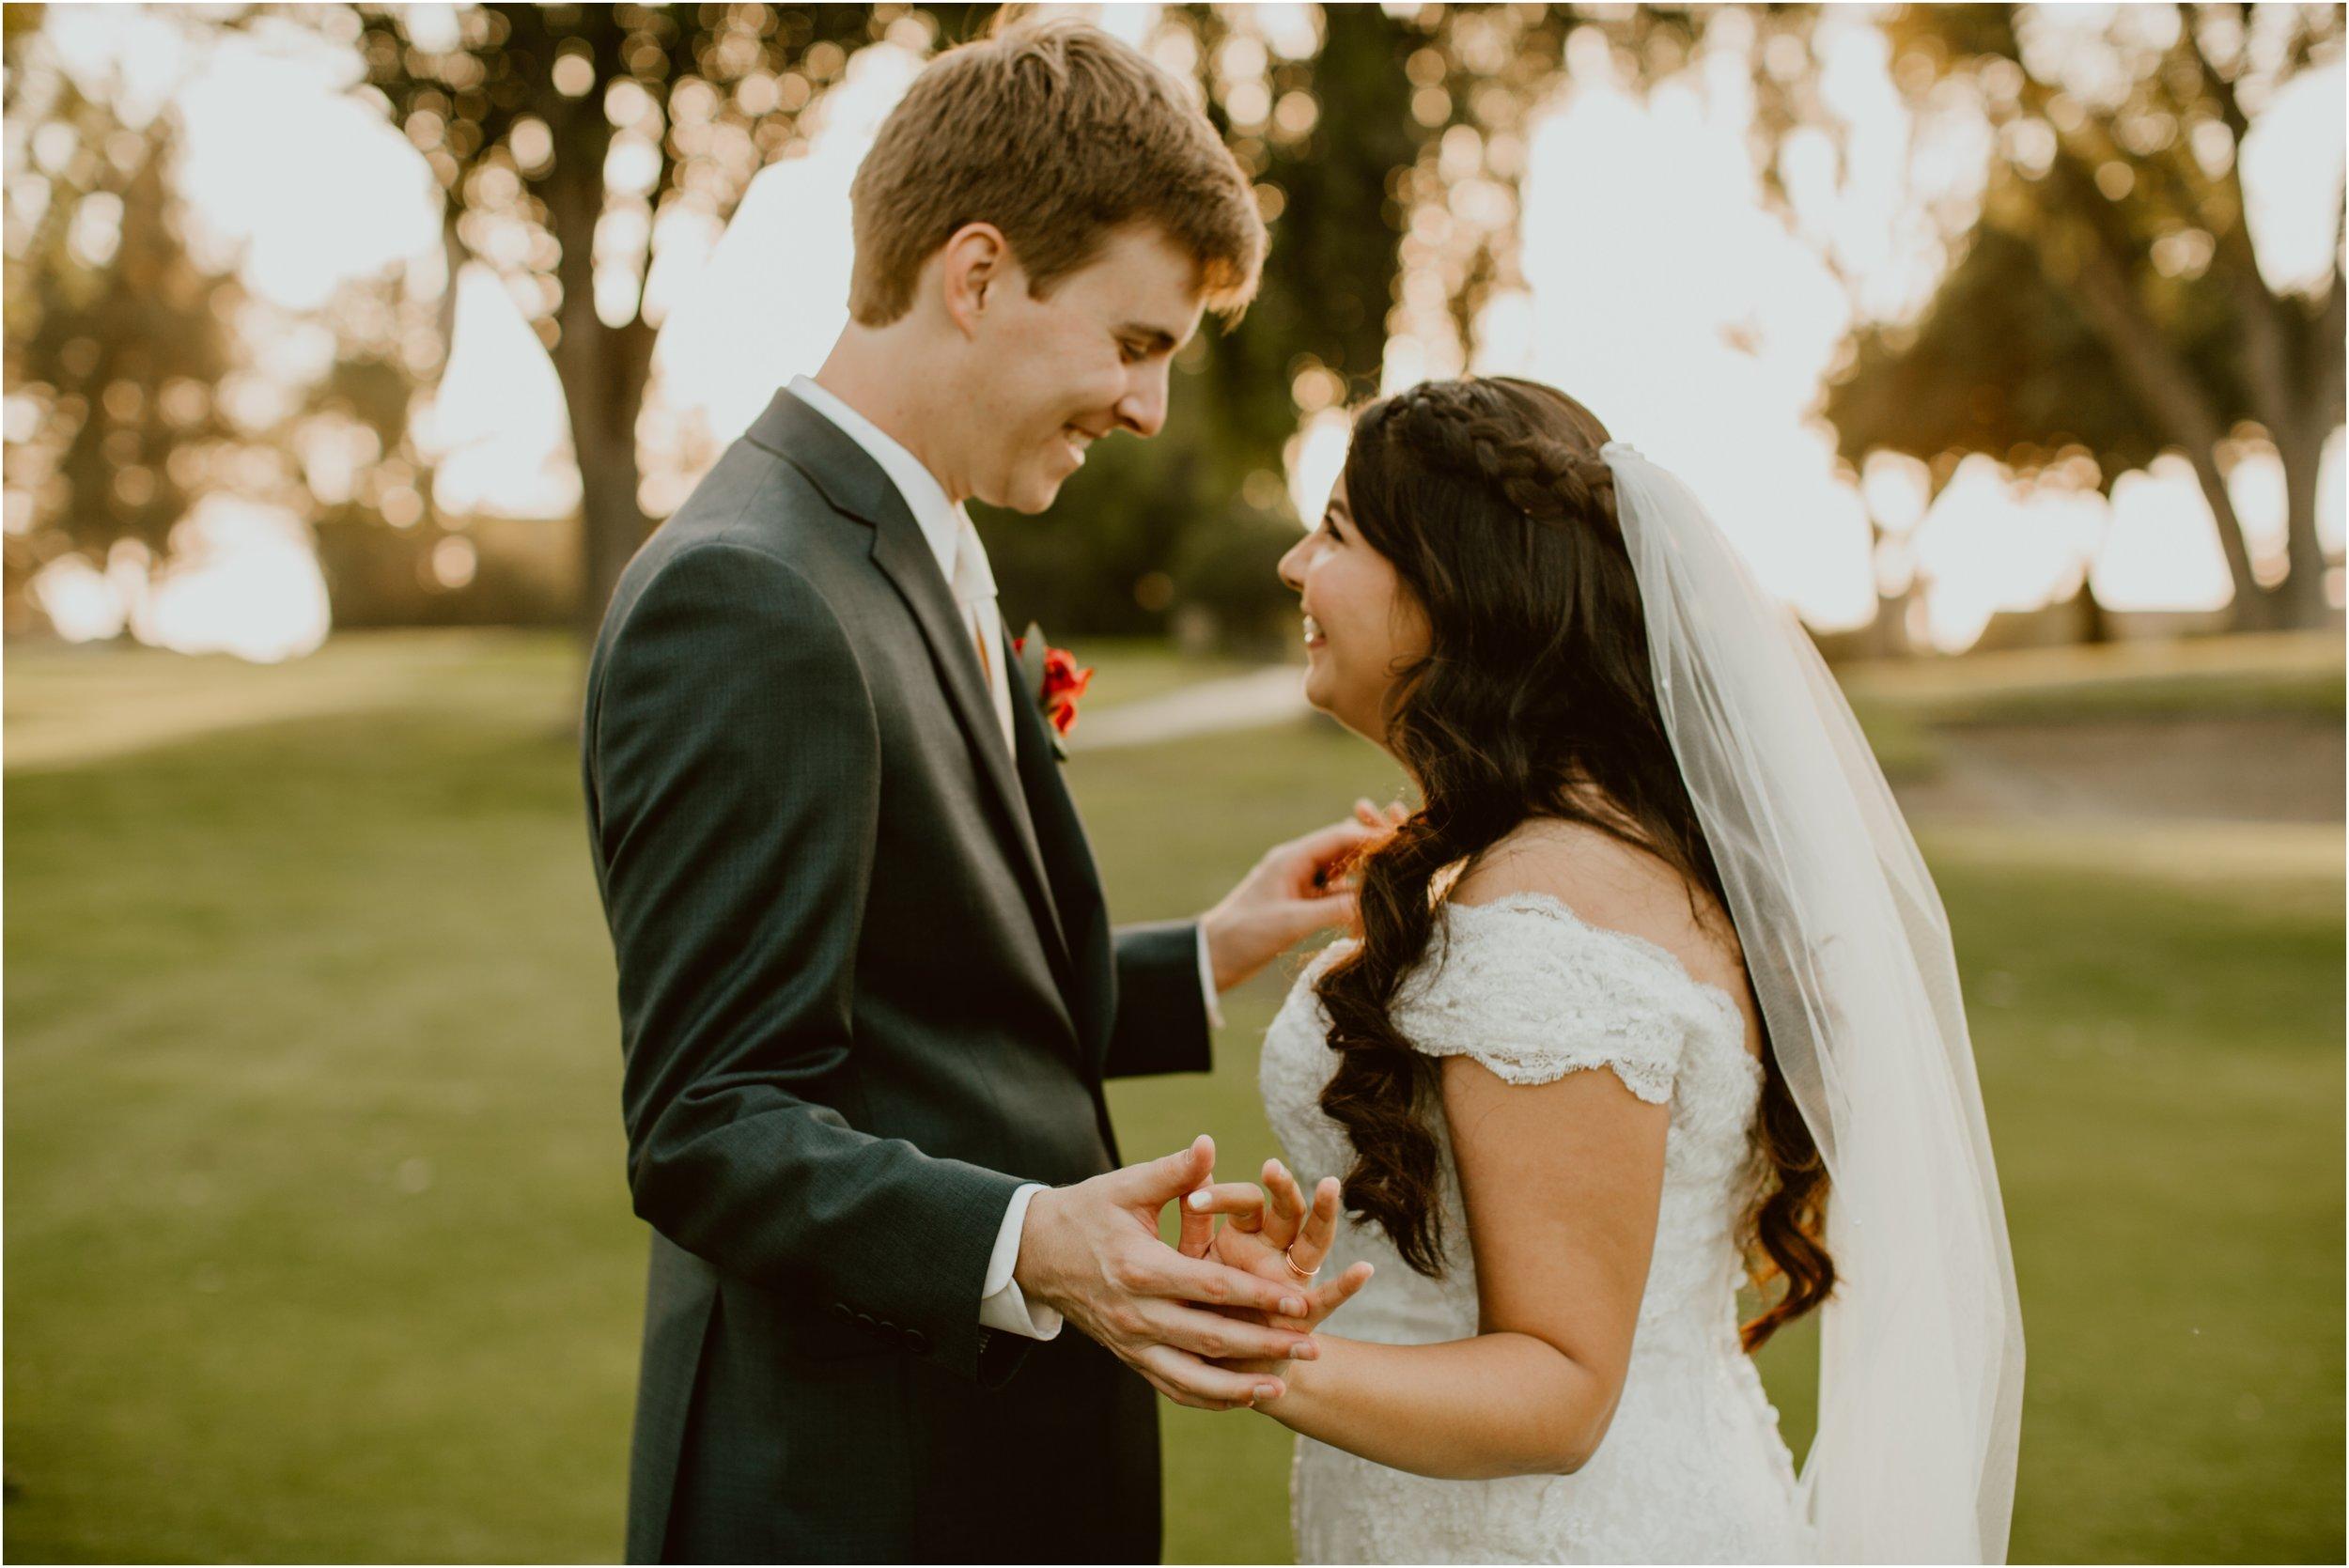 South-Hills-Country-Club-Wedding-D+J-Diana-Lake-Photography-426.jpg